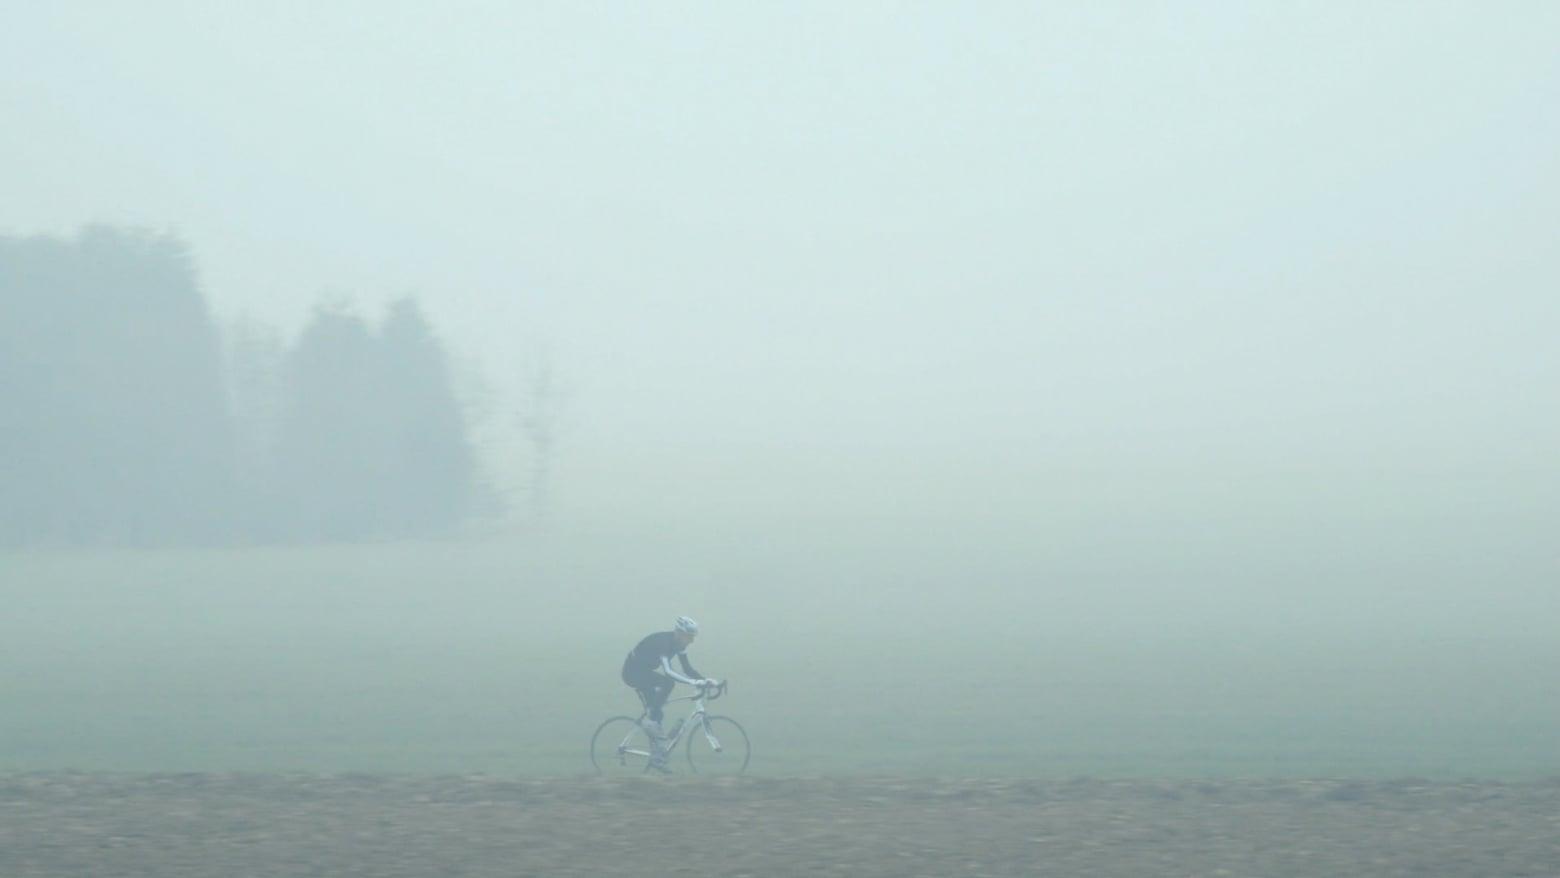 PROMO HOLLAND SPORT : Parijs Roubaix - Rob Hodselmans Cinematographer